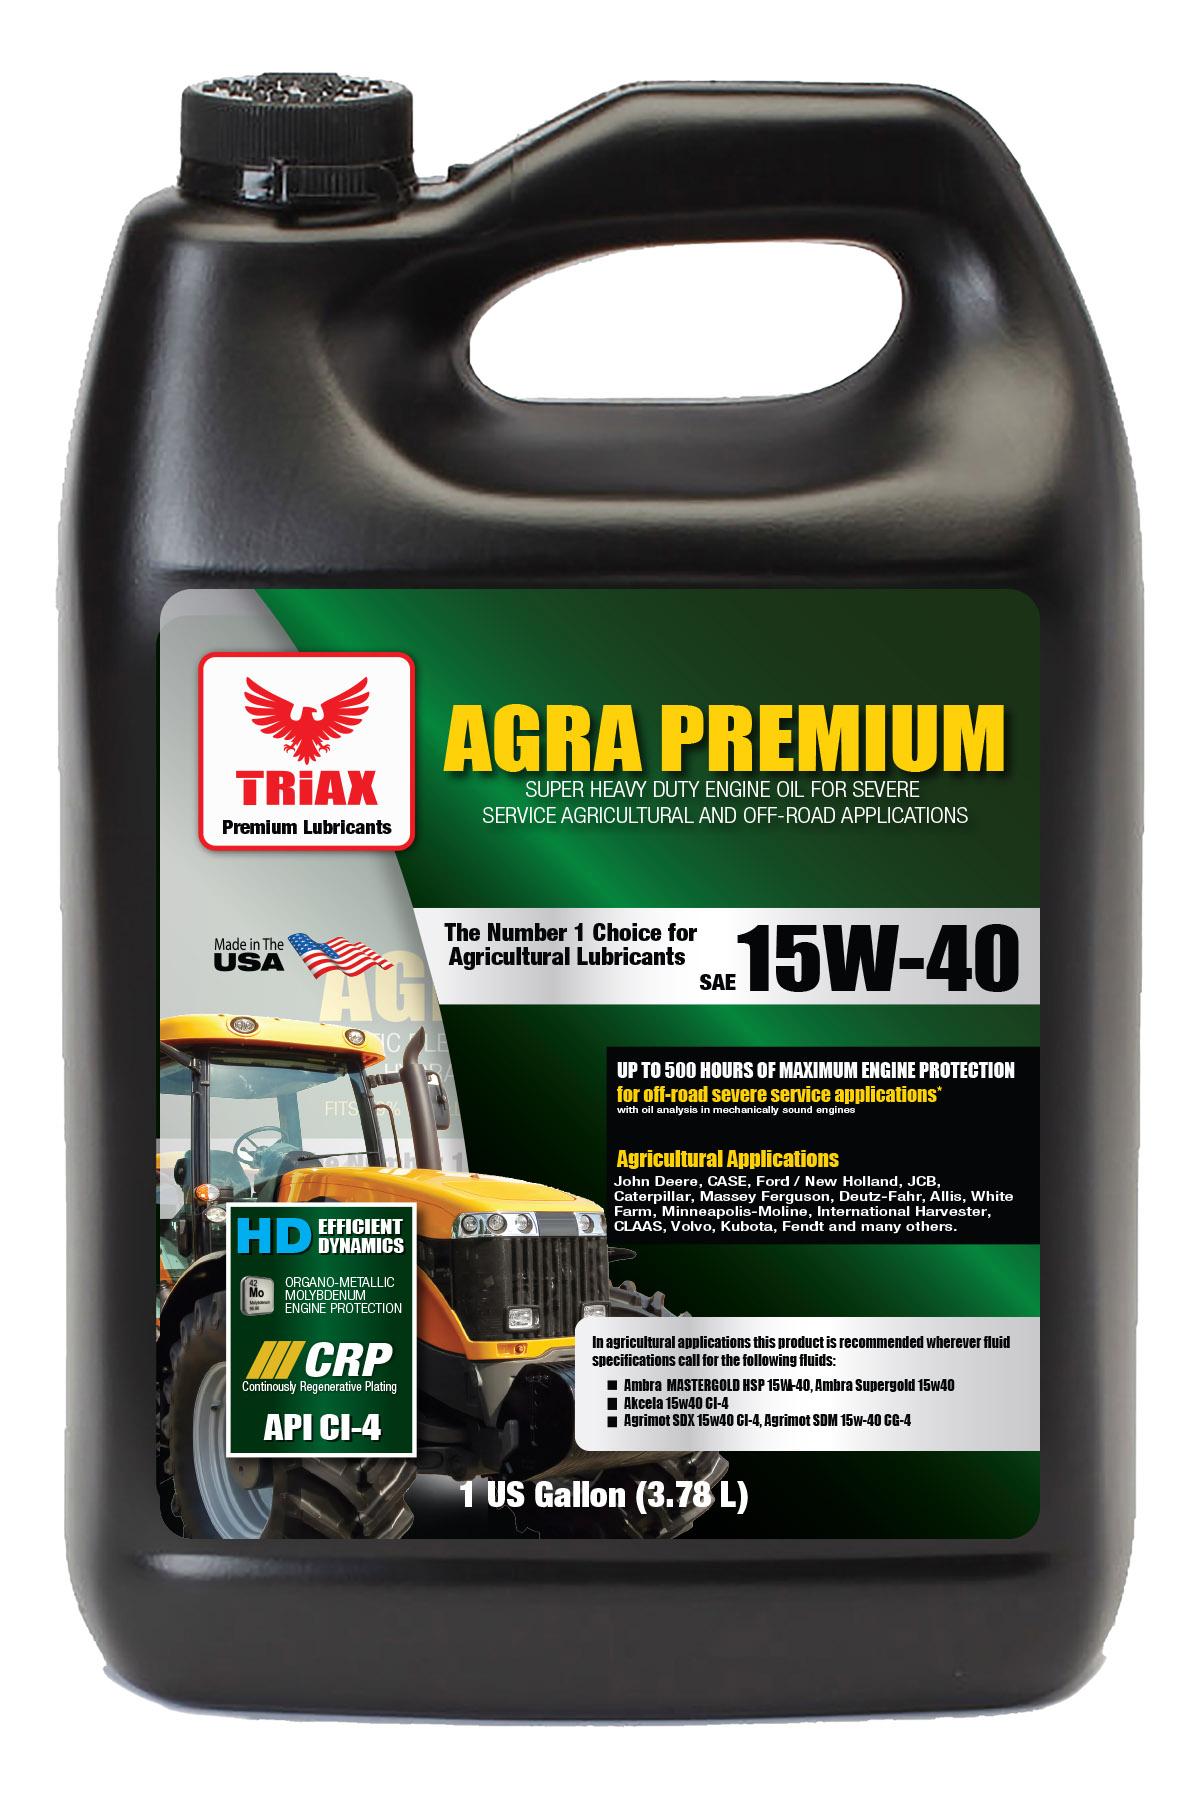 TRIAX AGRA Premium SHD 15W-40 CI-4 Plus